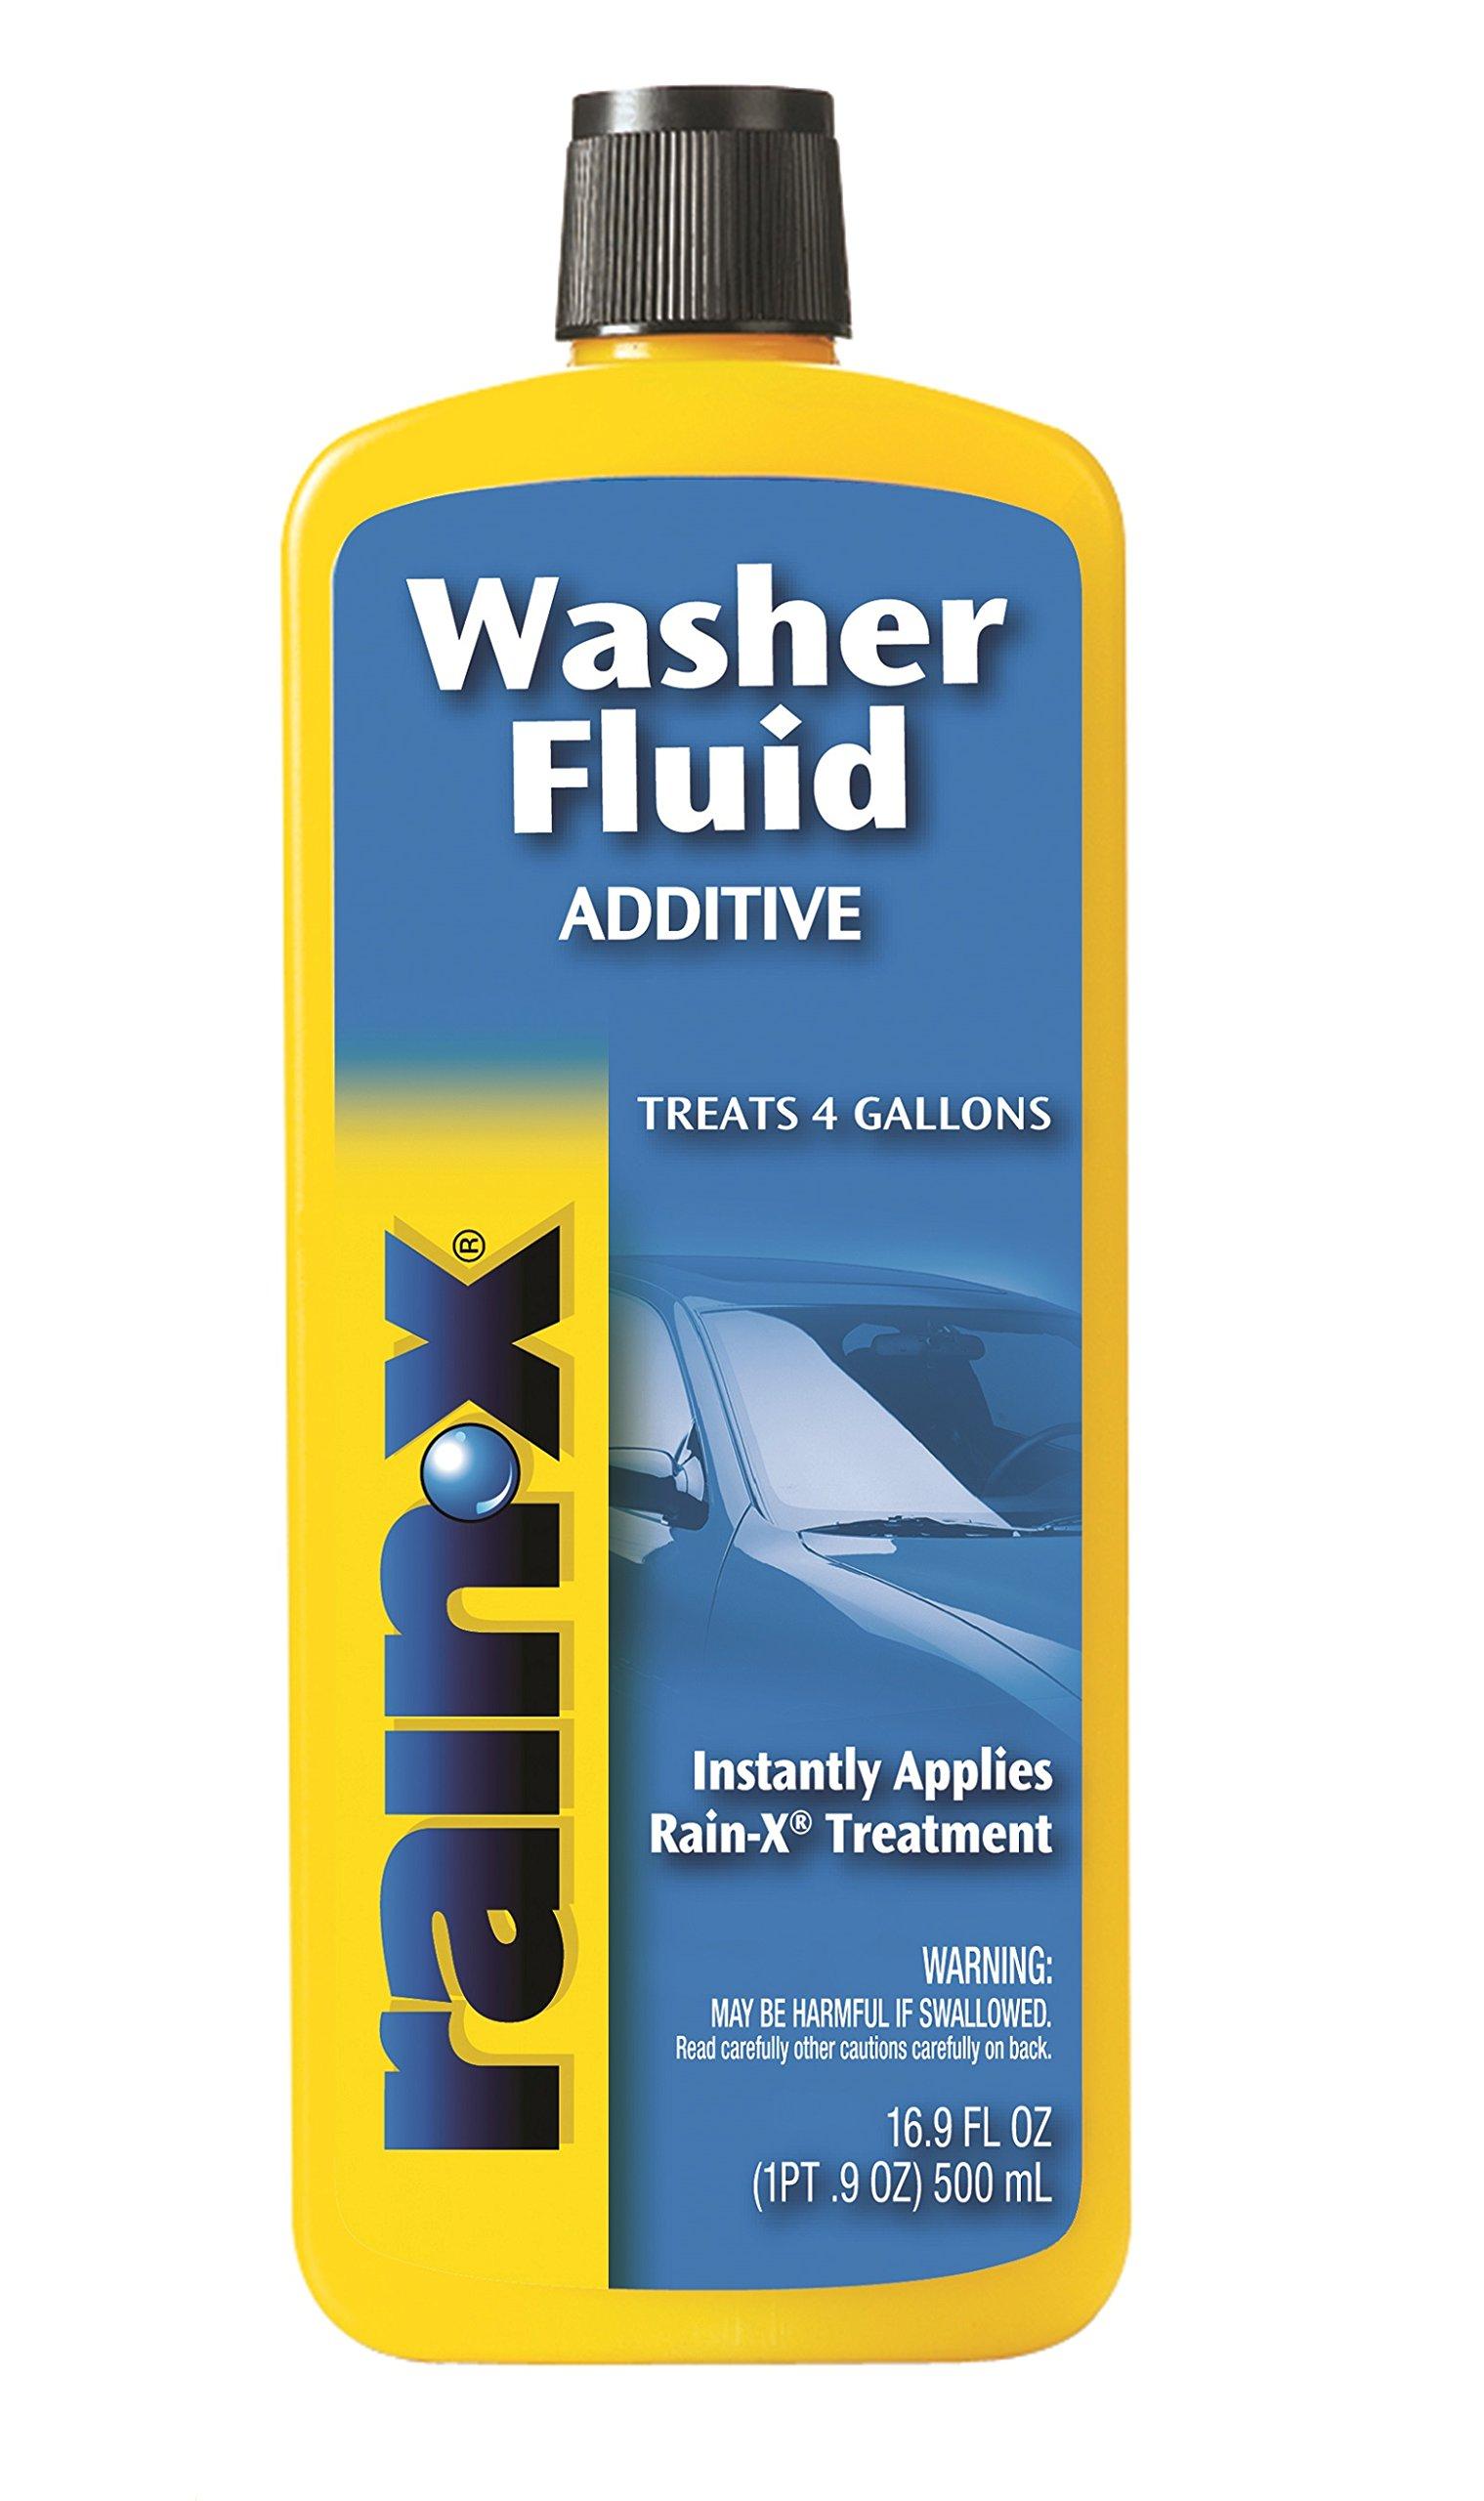 Rain-X RX11806D-8PK Washer Fluid Additive - 16.9 fl. oz. in Each, (Pack of 8)